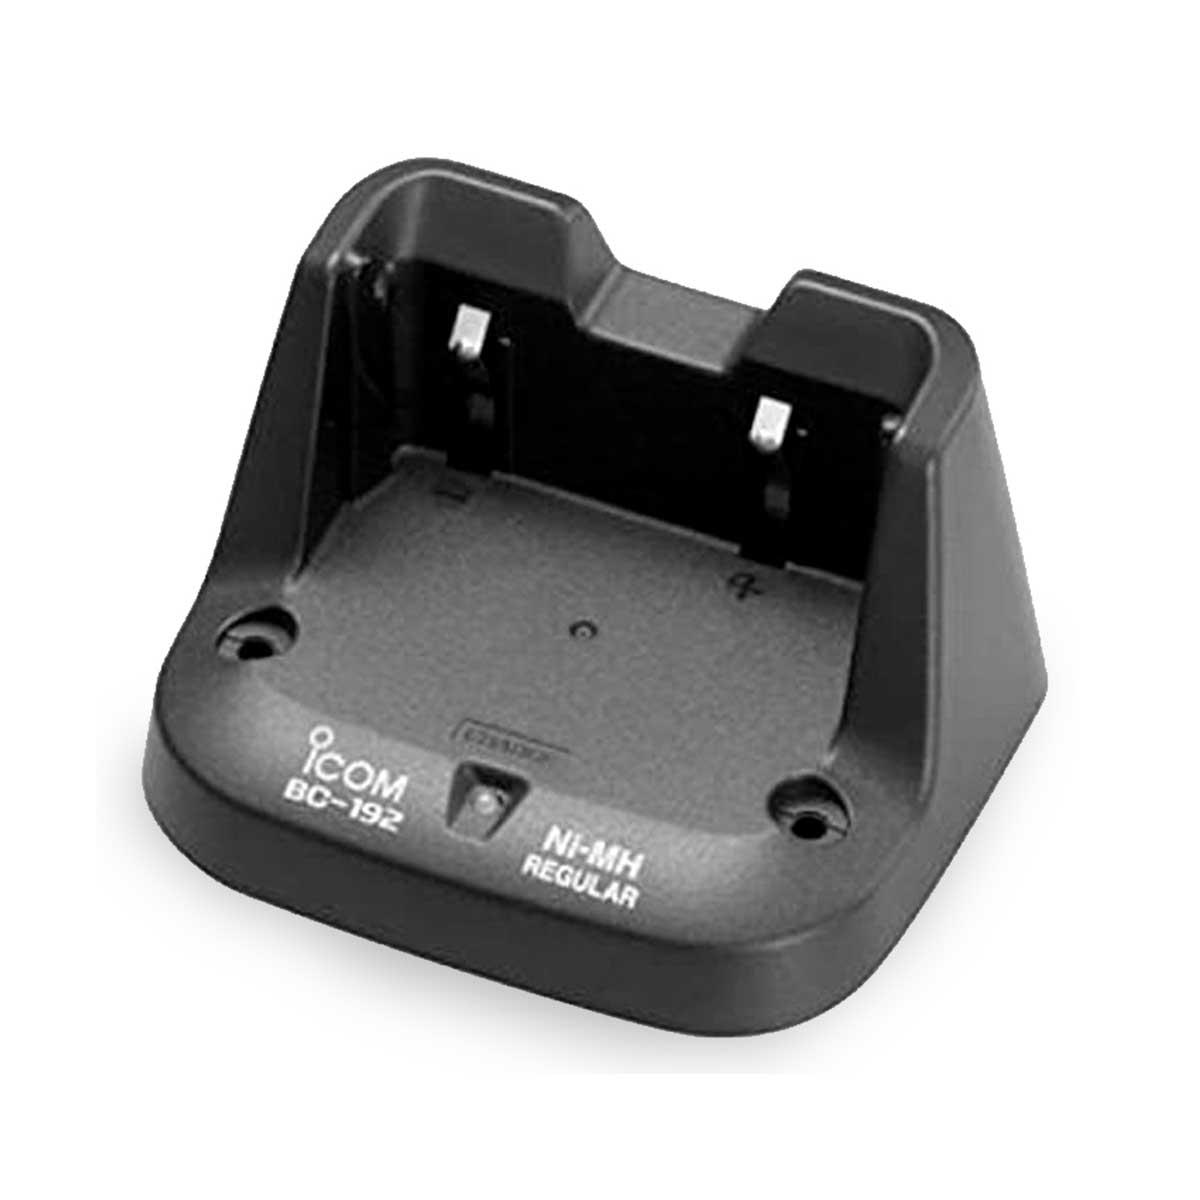 Cargador individual Icom BC-192 para radio IC-F4003